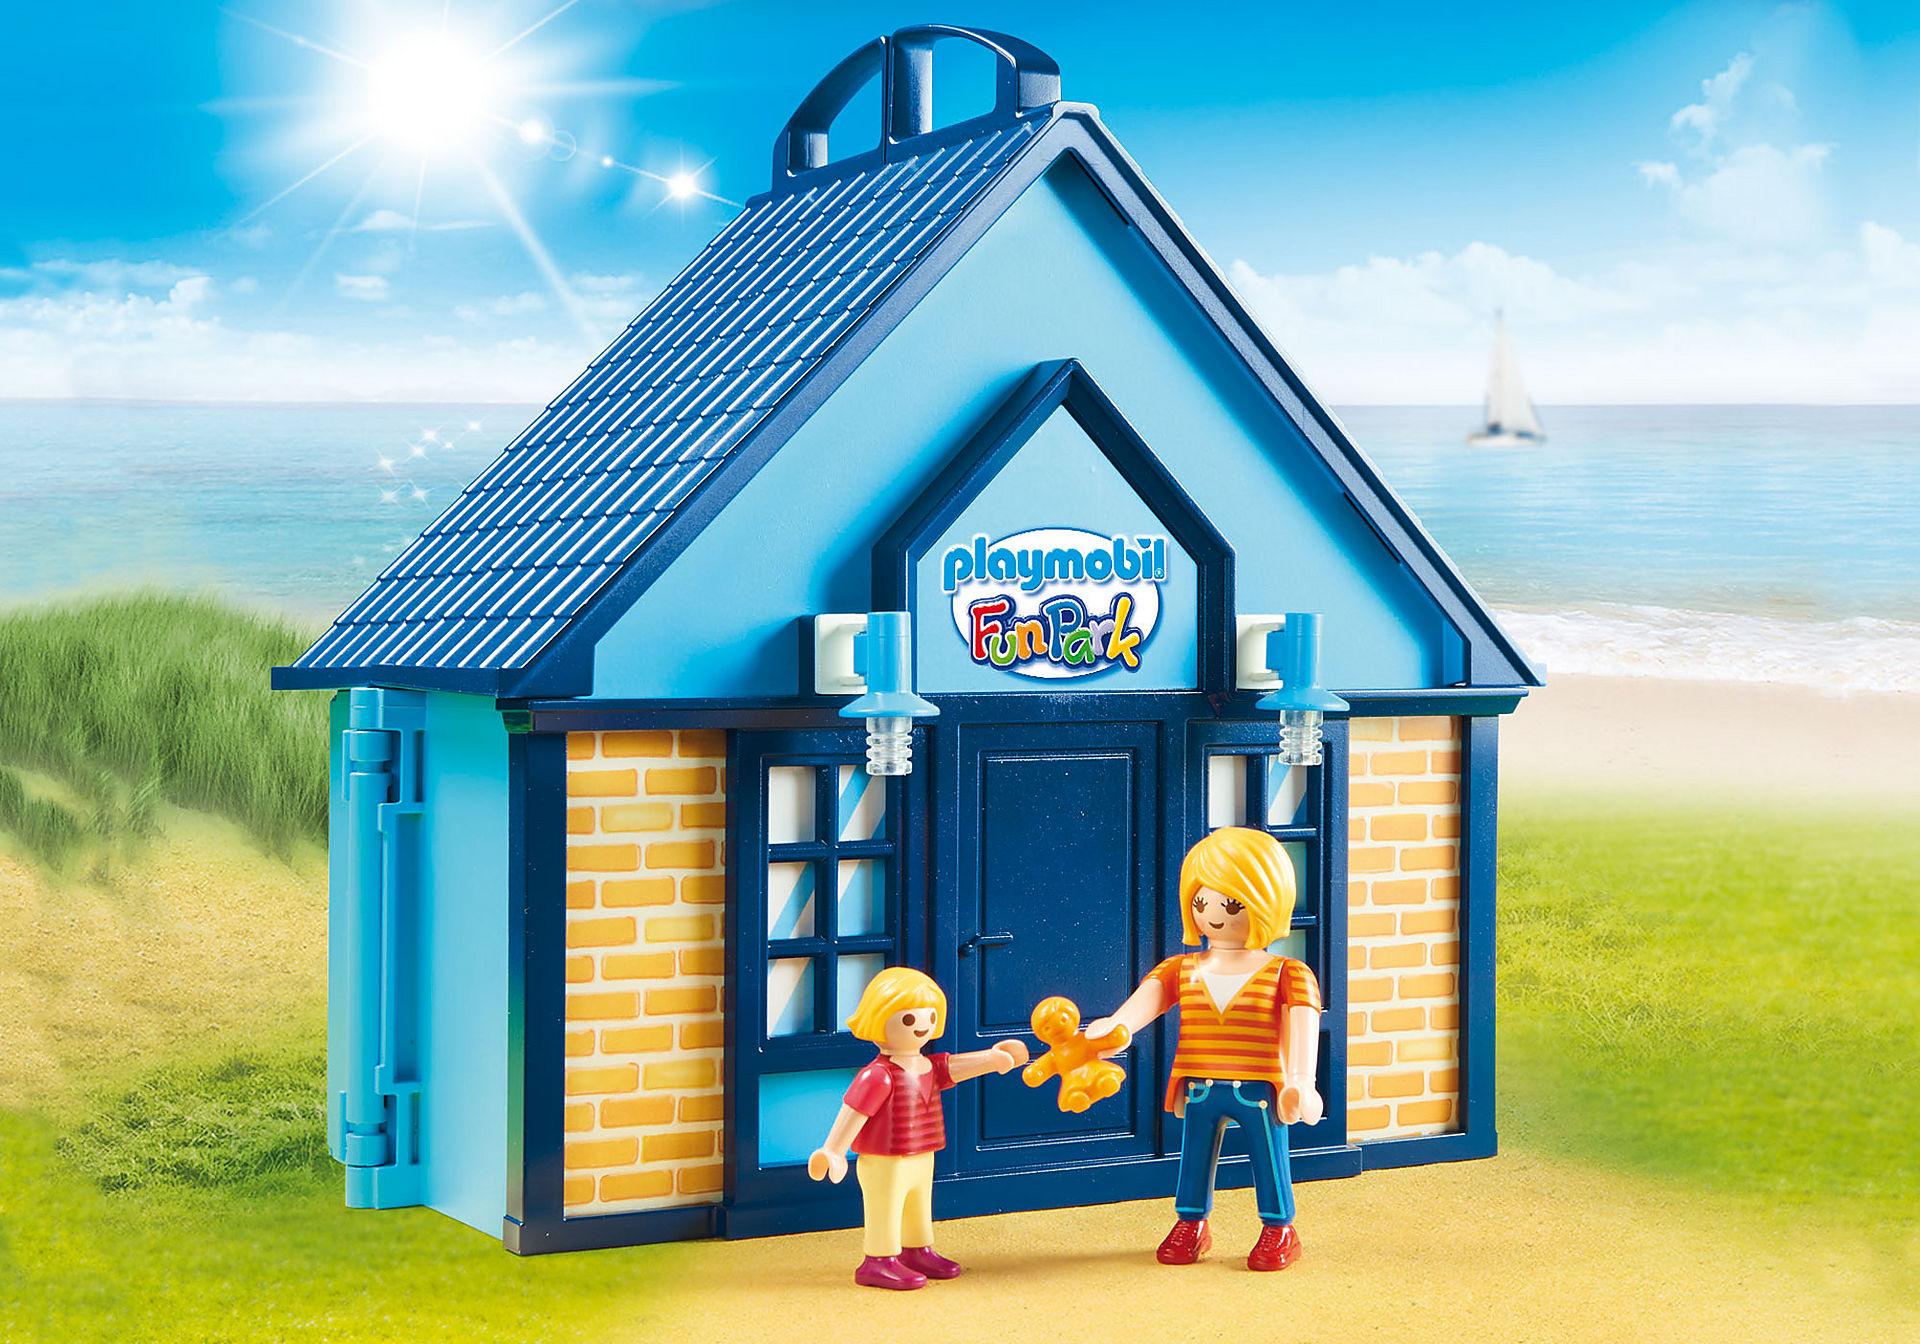 http://media.playmobil.com/i/playmobil/70219_product_extra1/PLAYMOBIL - Funpark Casa de Vacaciones Maletín